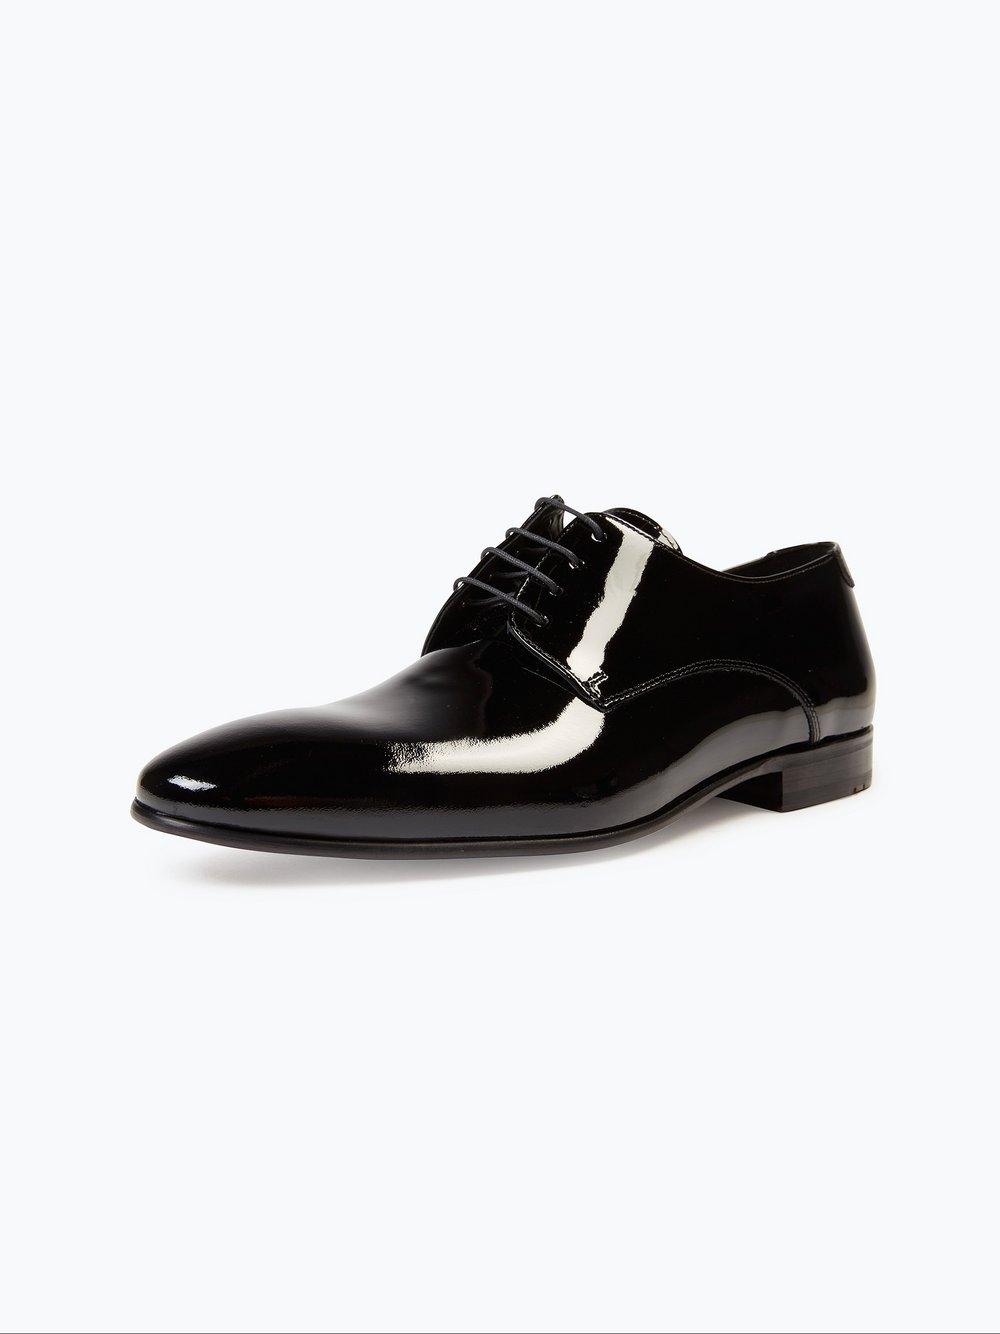 Lloyd – Męskie buty sznurowane ze skóry – Jerez, czarny Van Graaf 375562-0003-00080